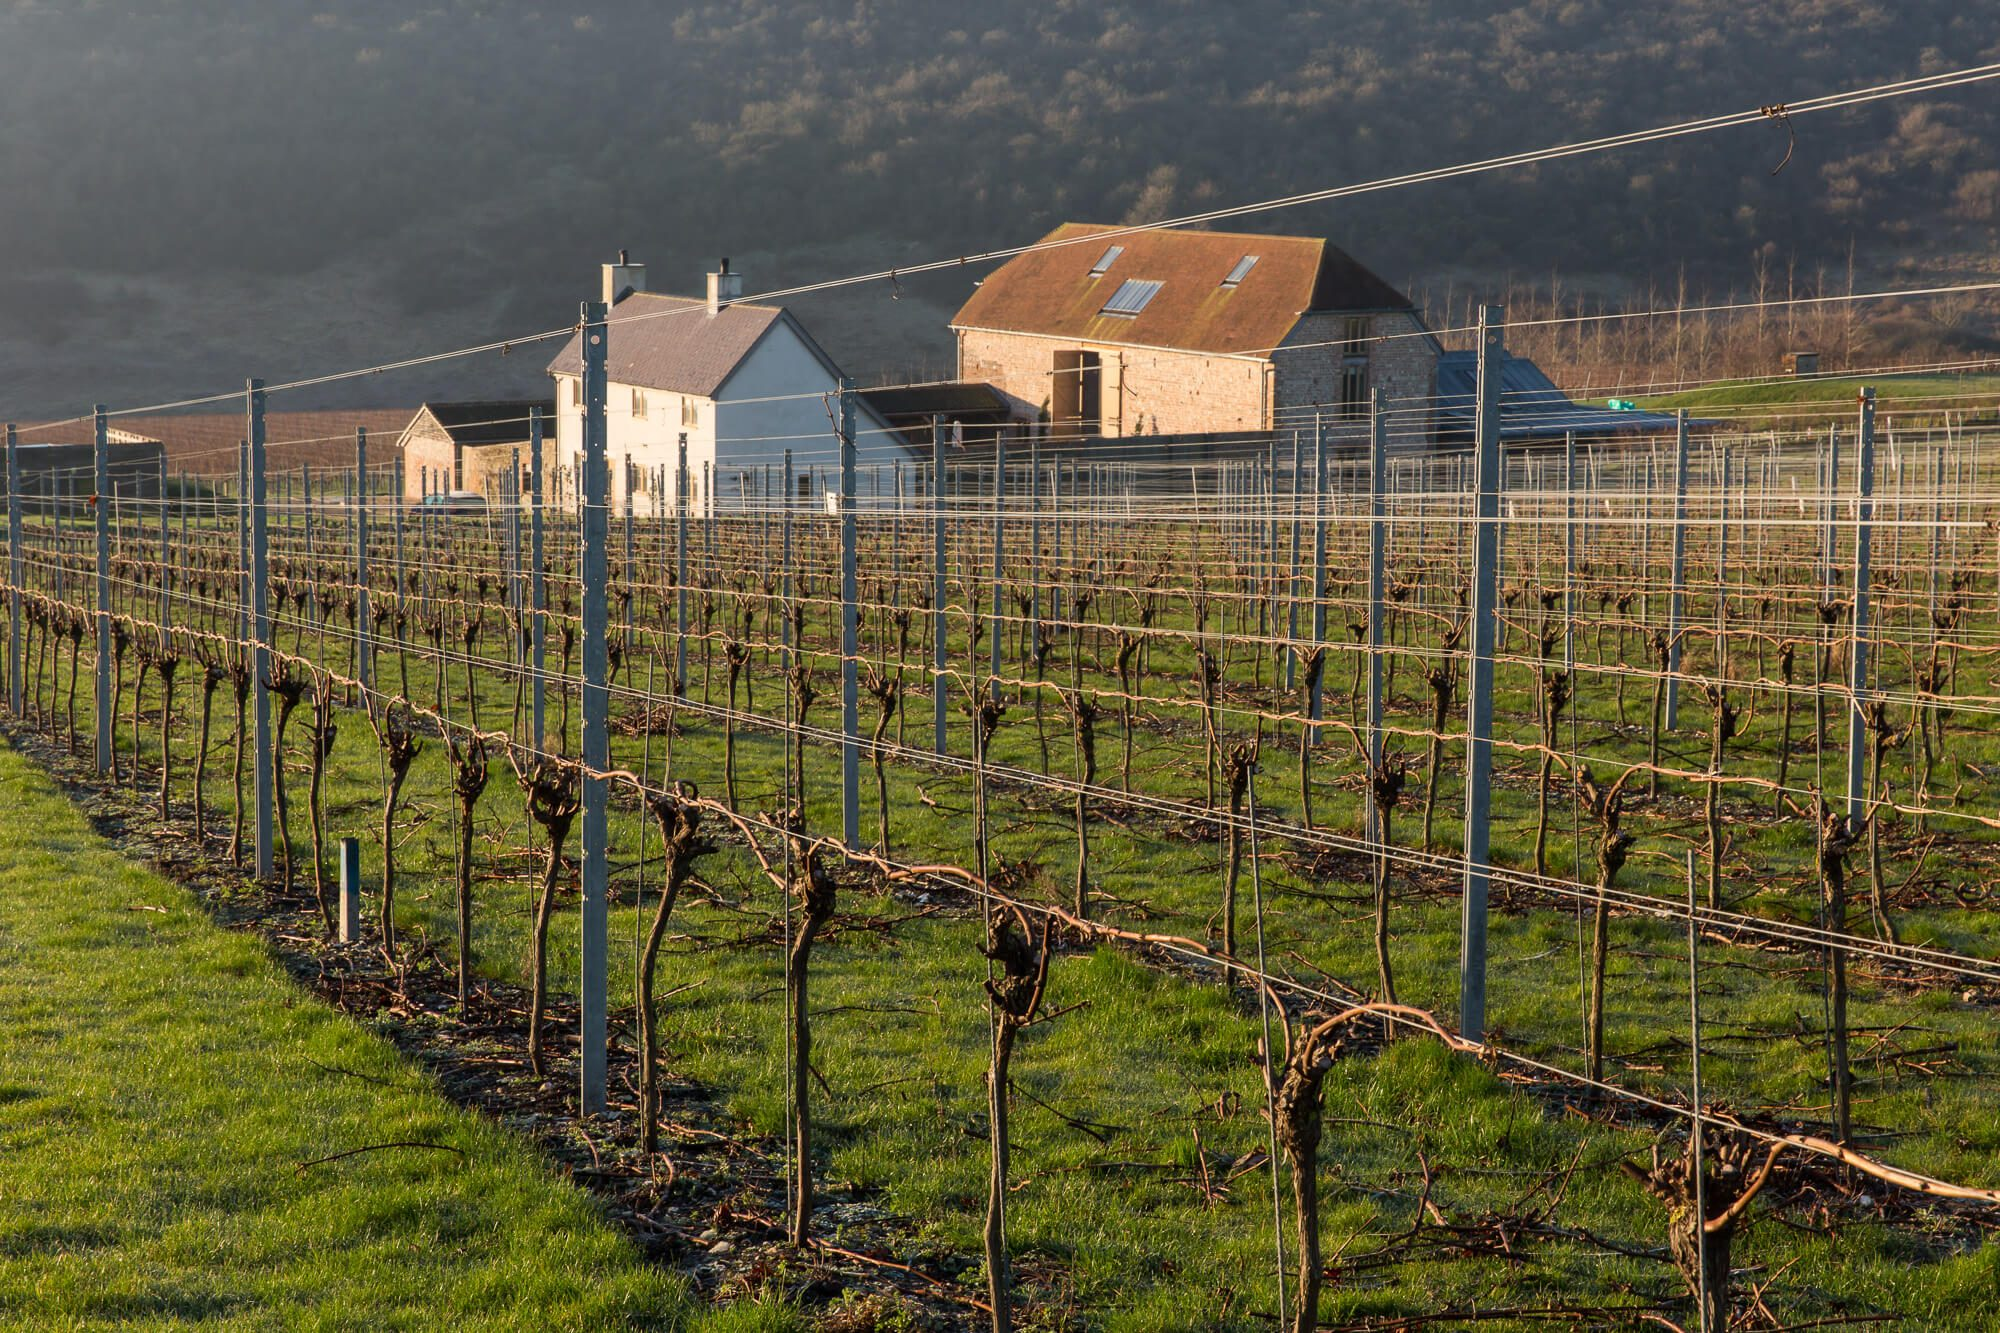 Flint Barns and Pruned Vines